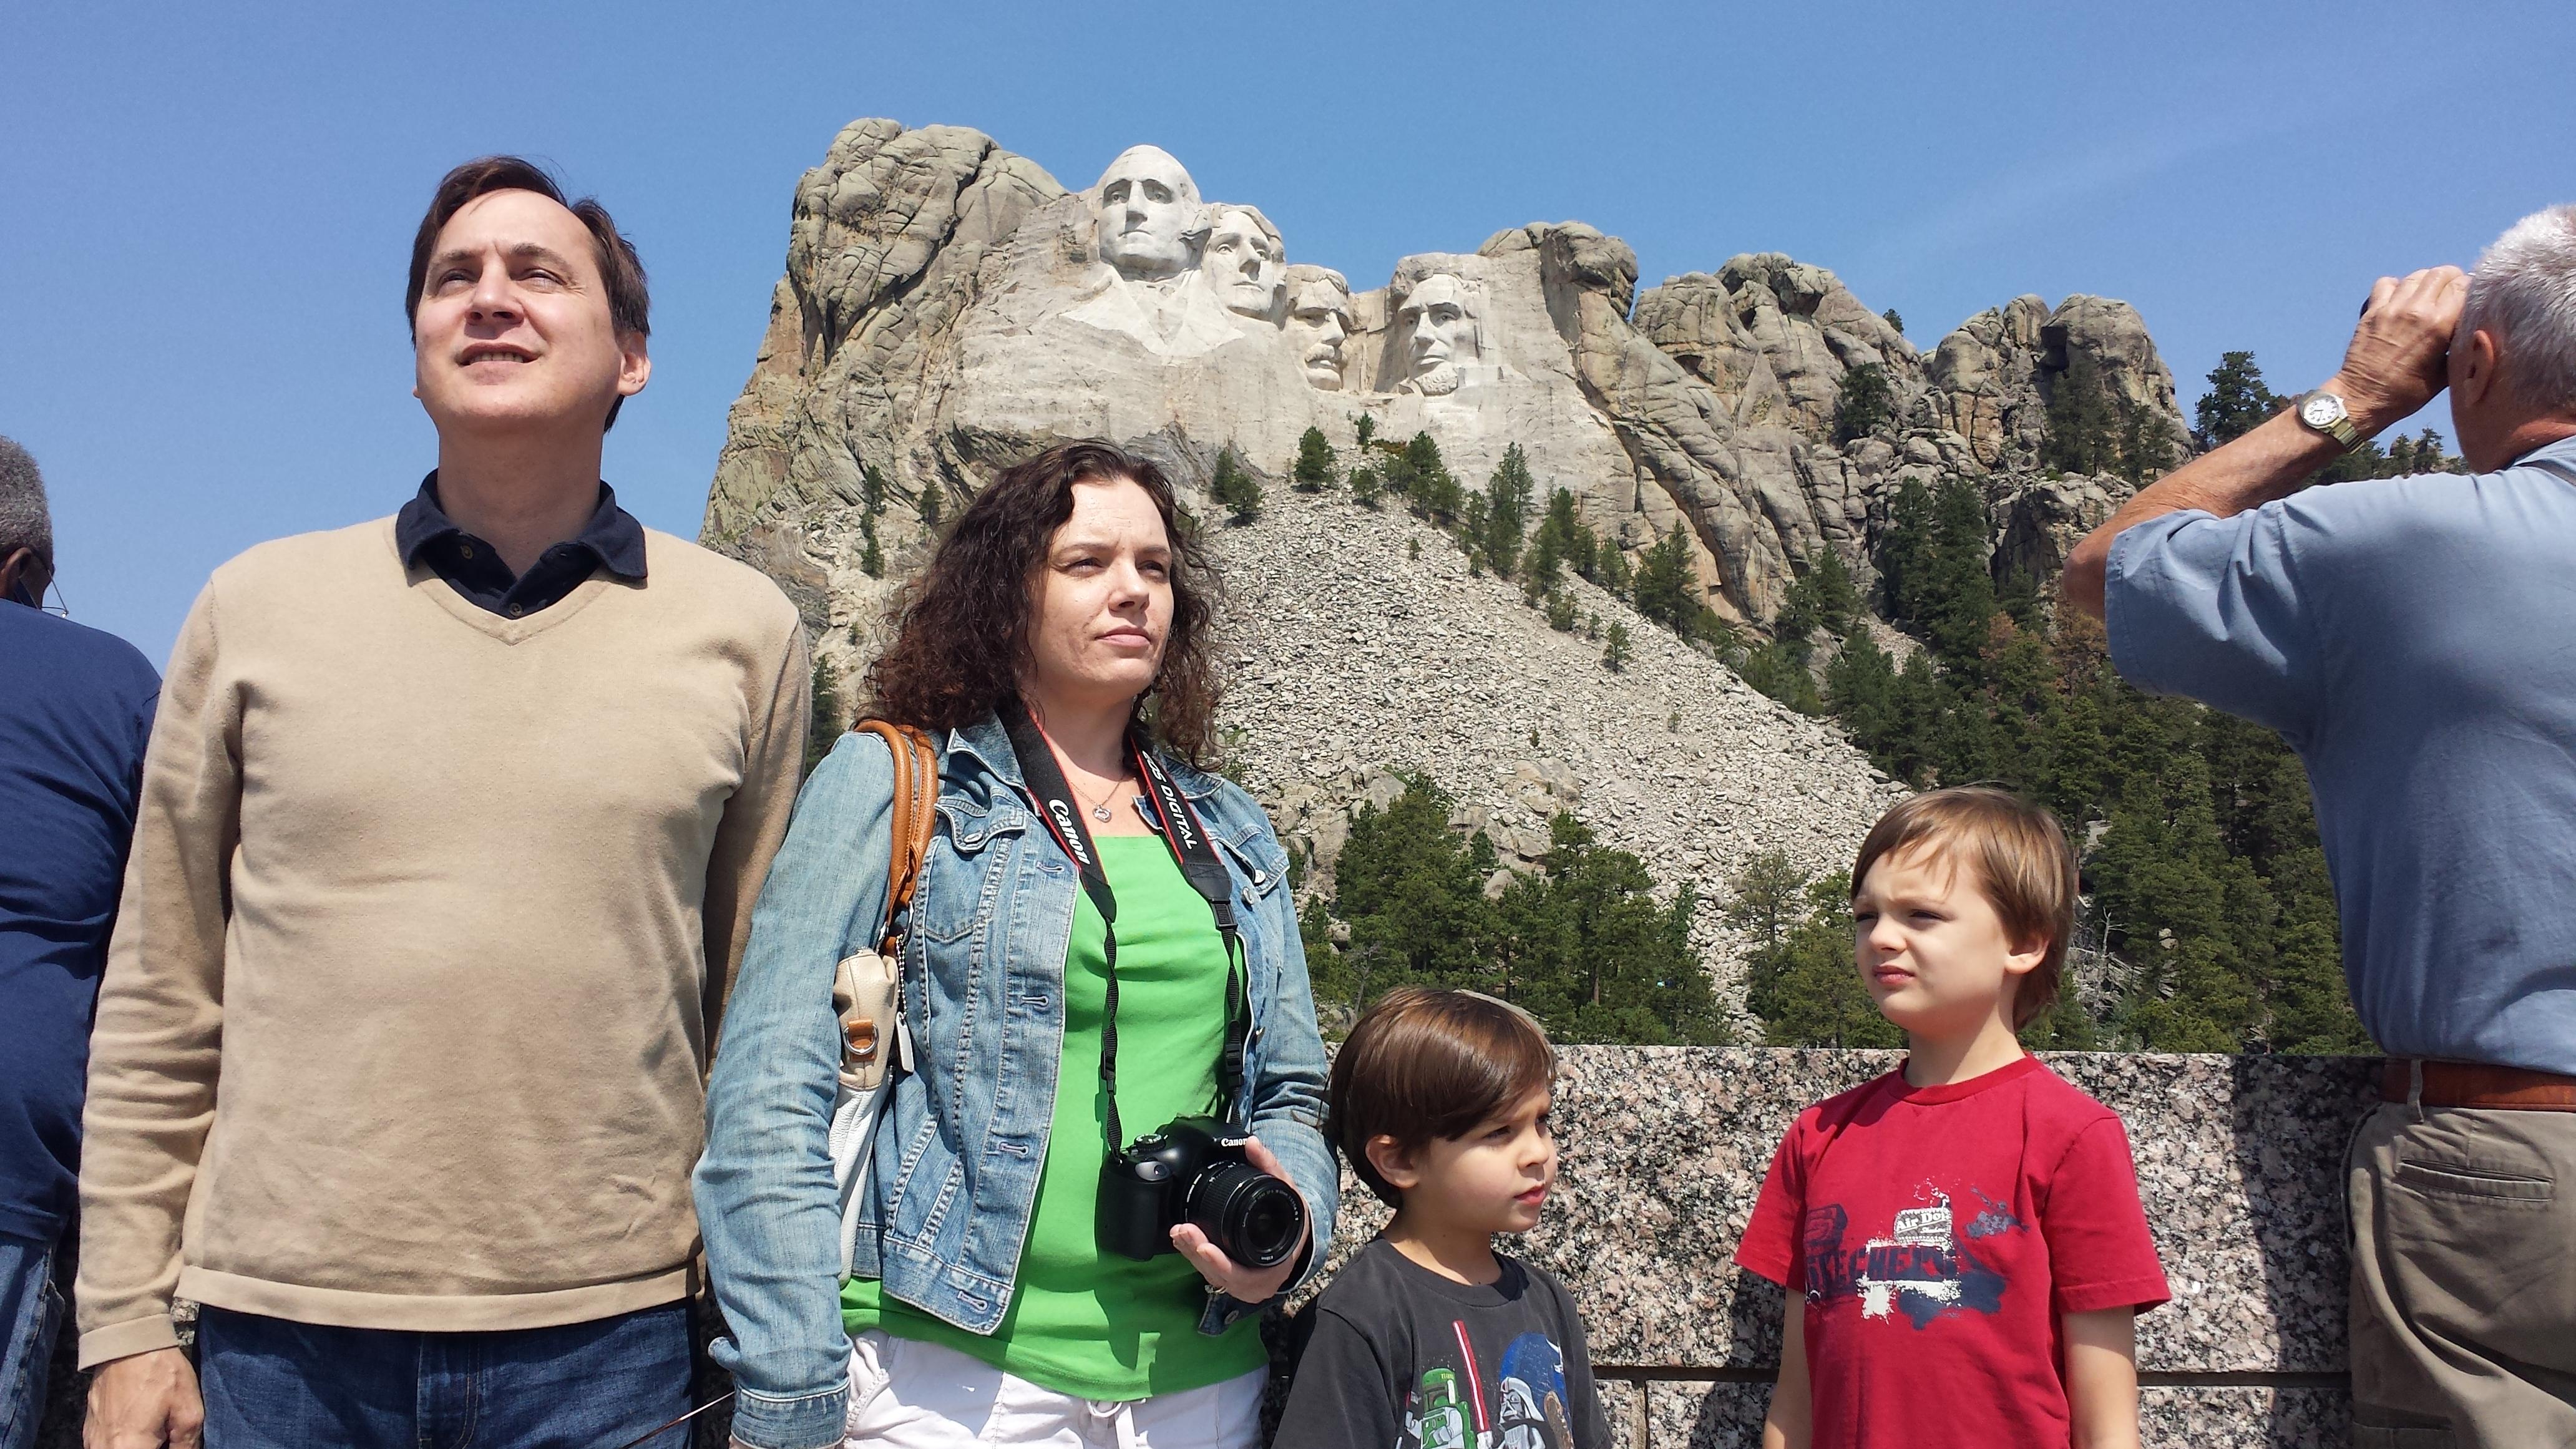 Chambers Family at Mount Rushmore 2014